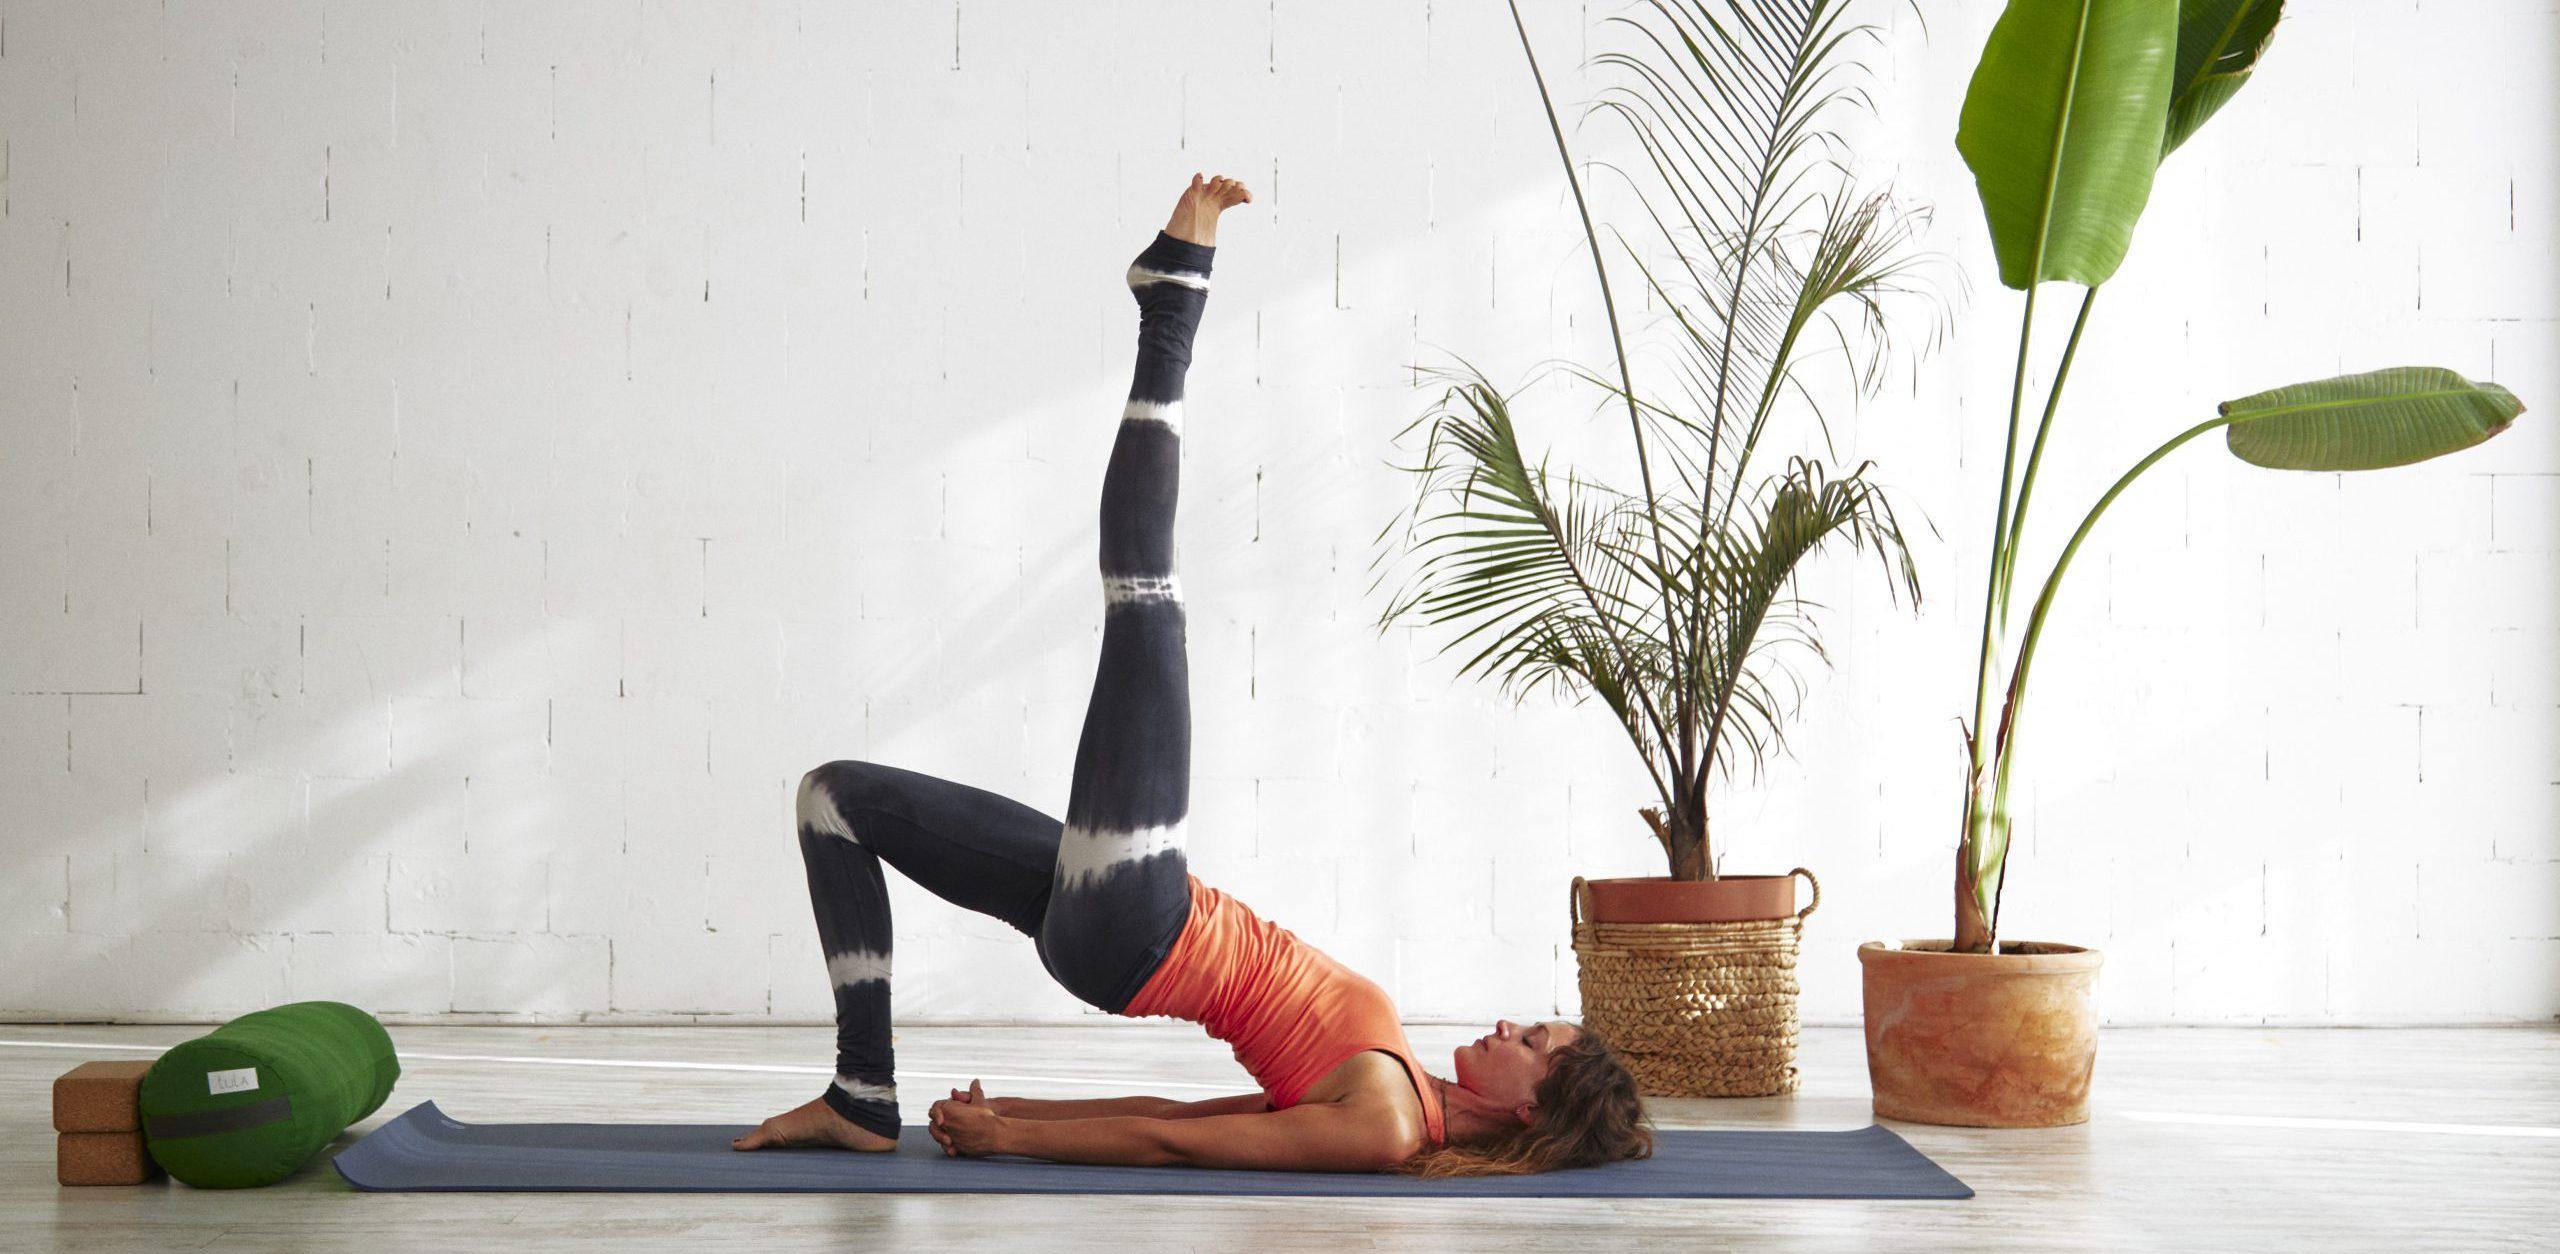 Thuis yoga doen